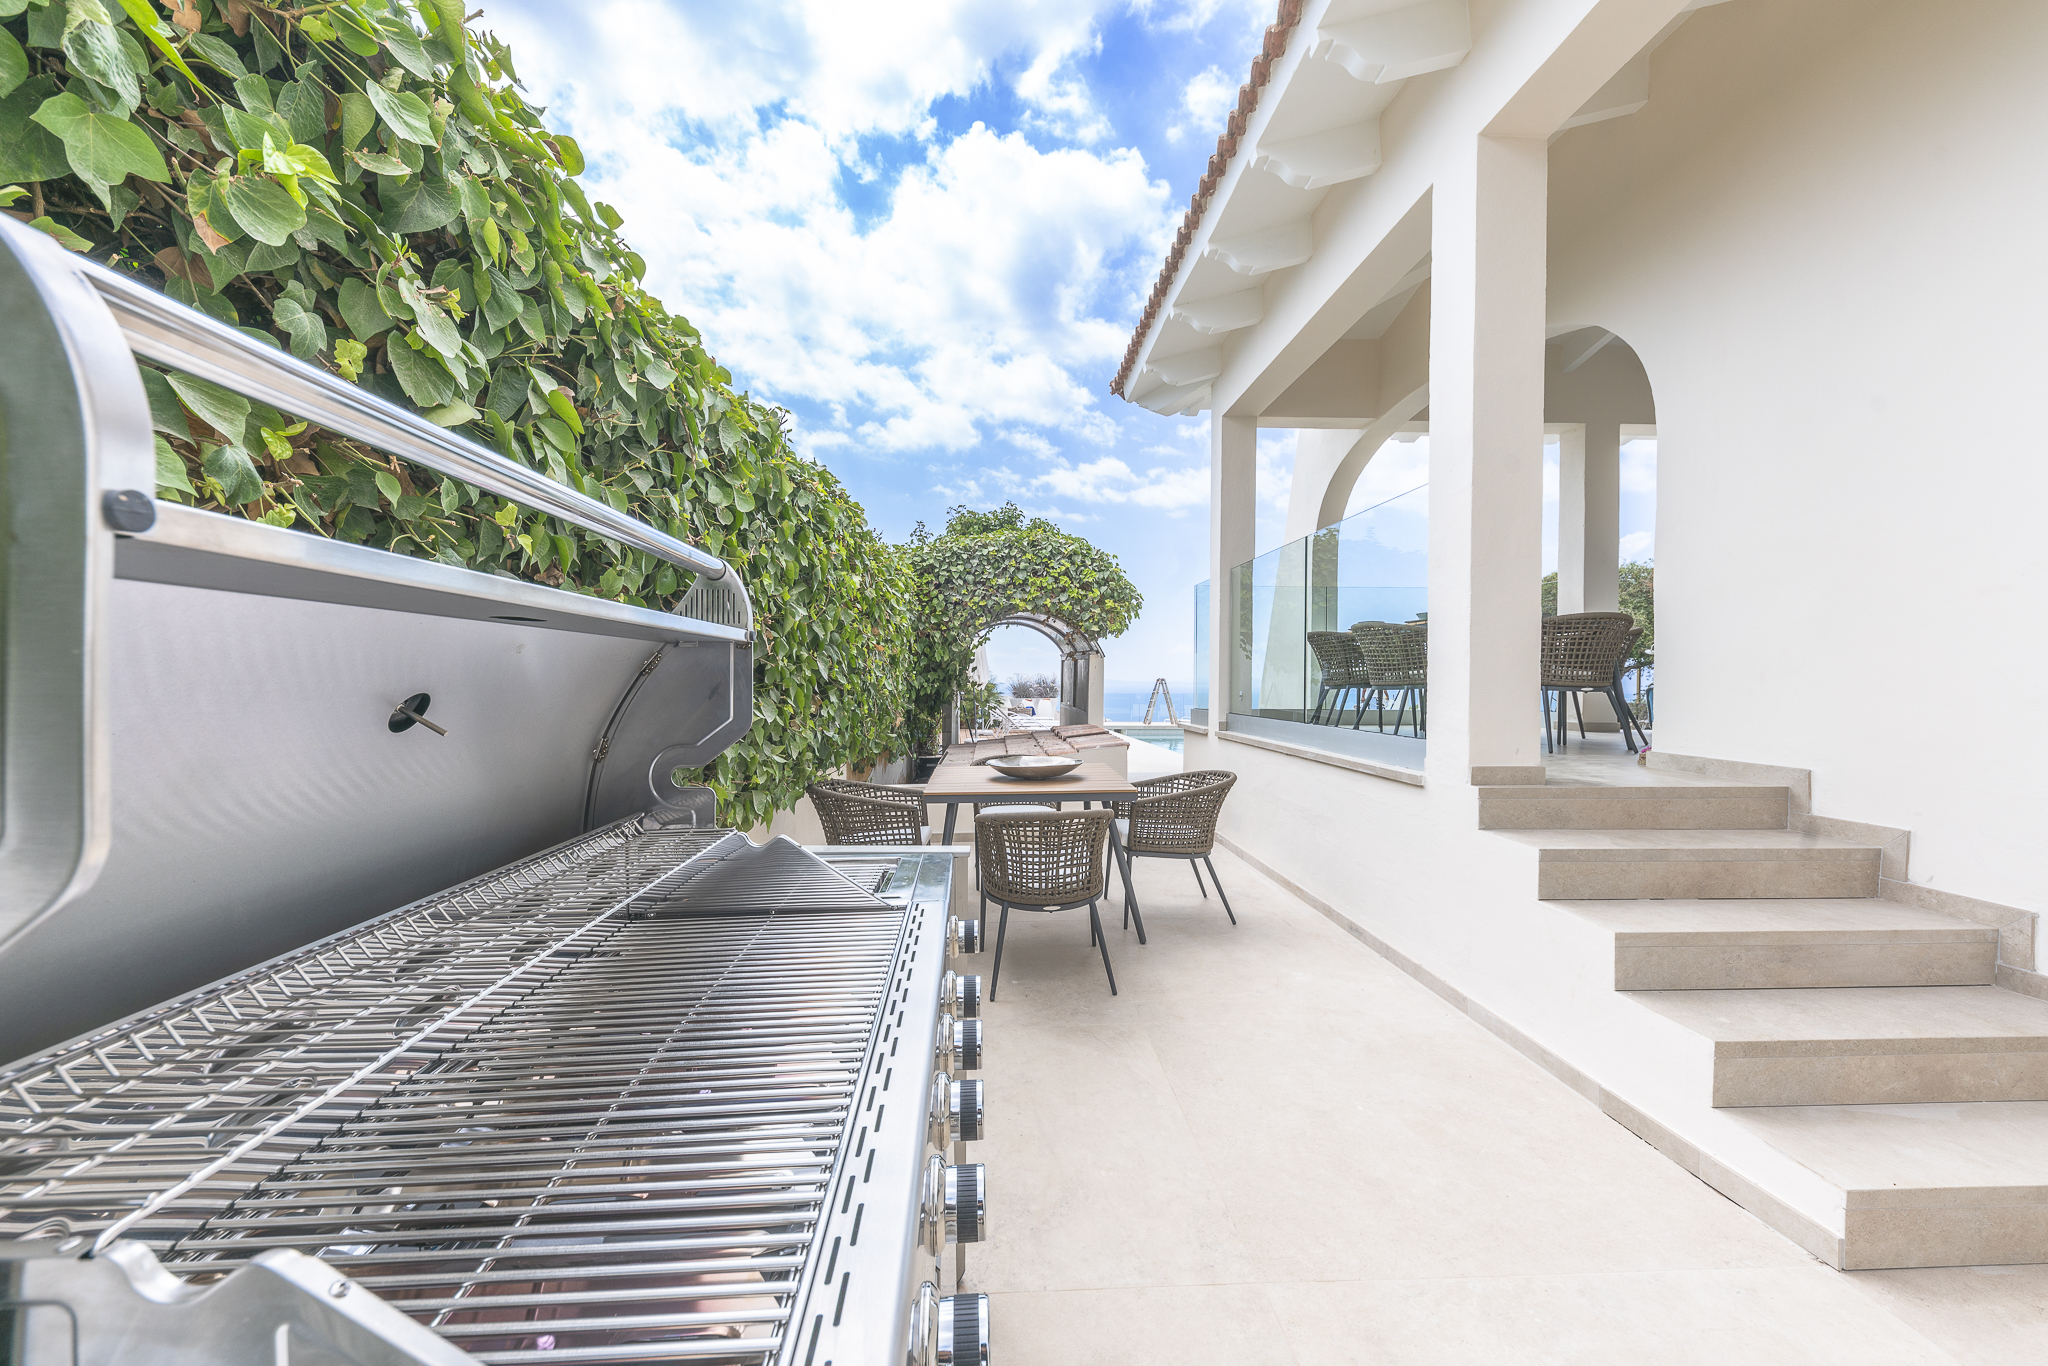 Apartment Luxury villa Luna  piscina climatizada  wi-fi  gym  sauna photo 19977582